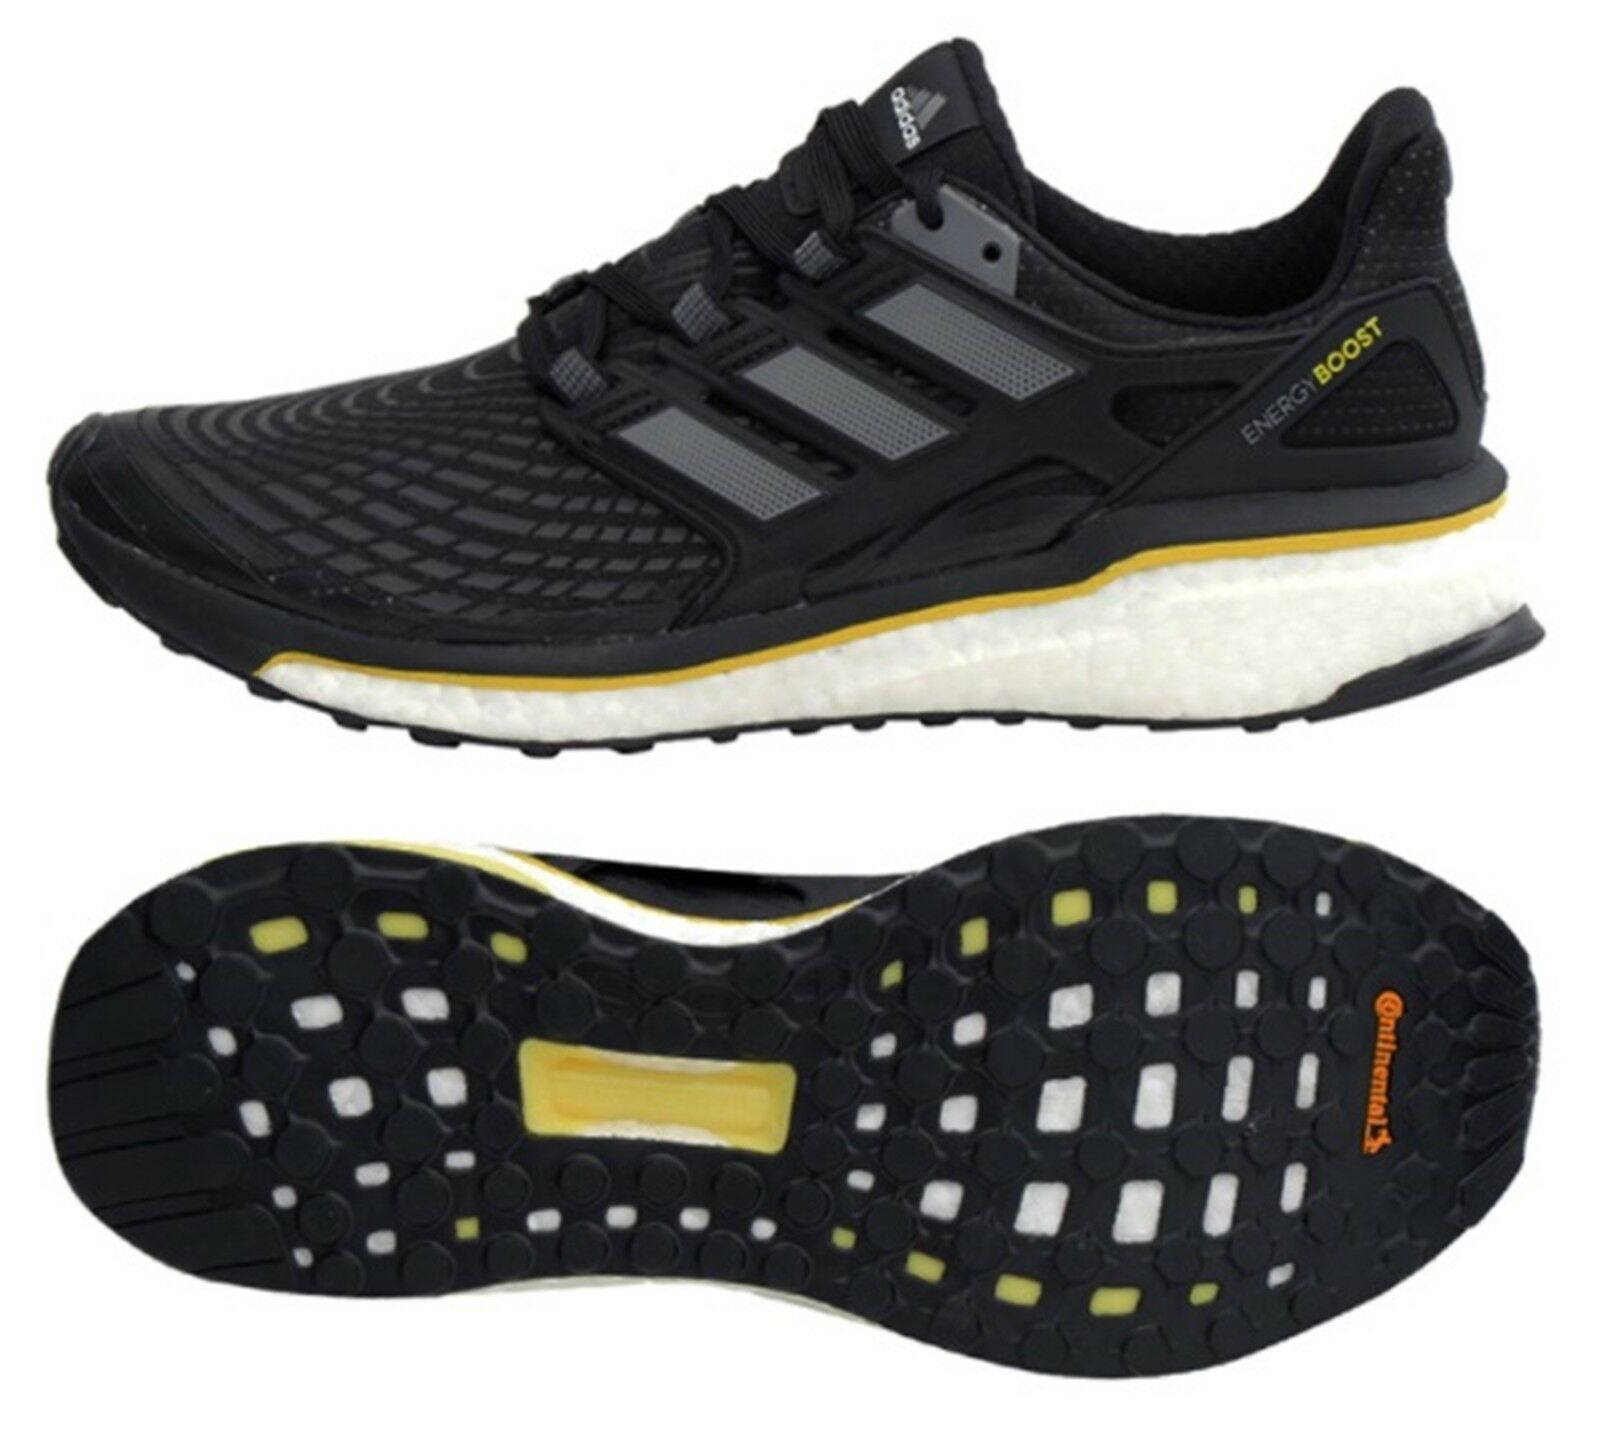 Adidas mannen Energy Boost Training schoenen hardlopen zwart sportschoenen GYM schoen CQ1762